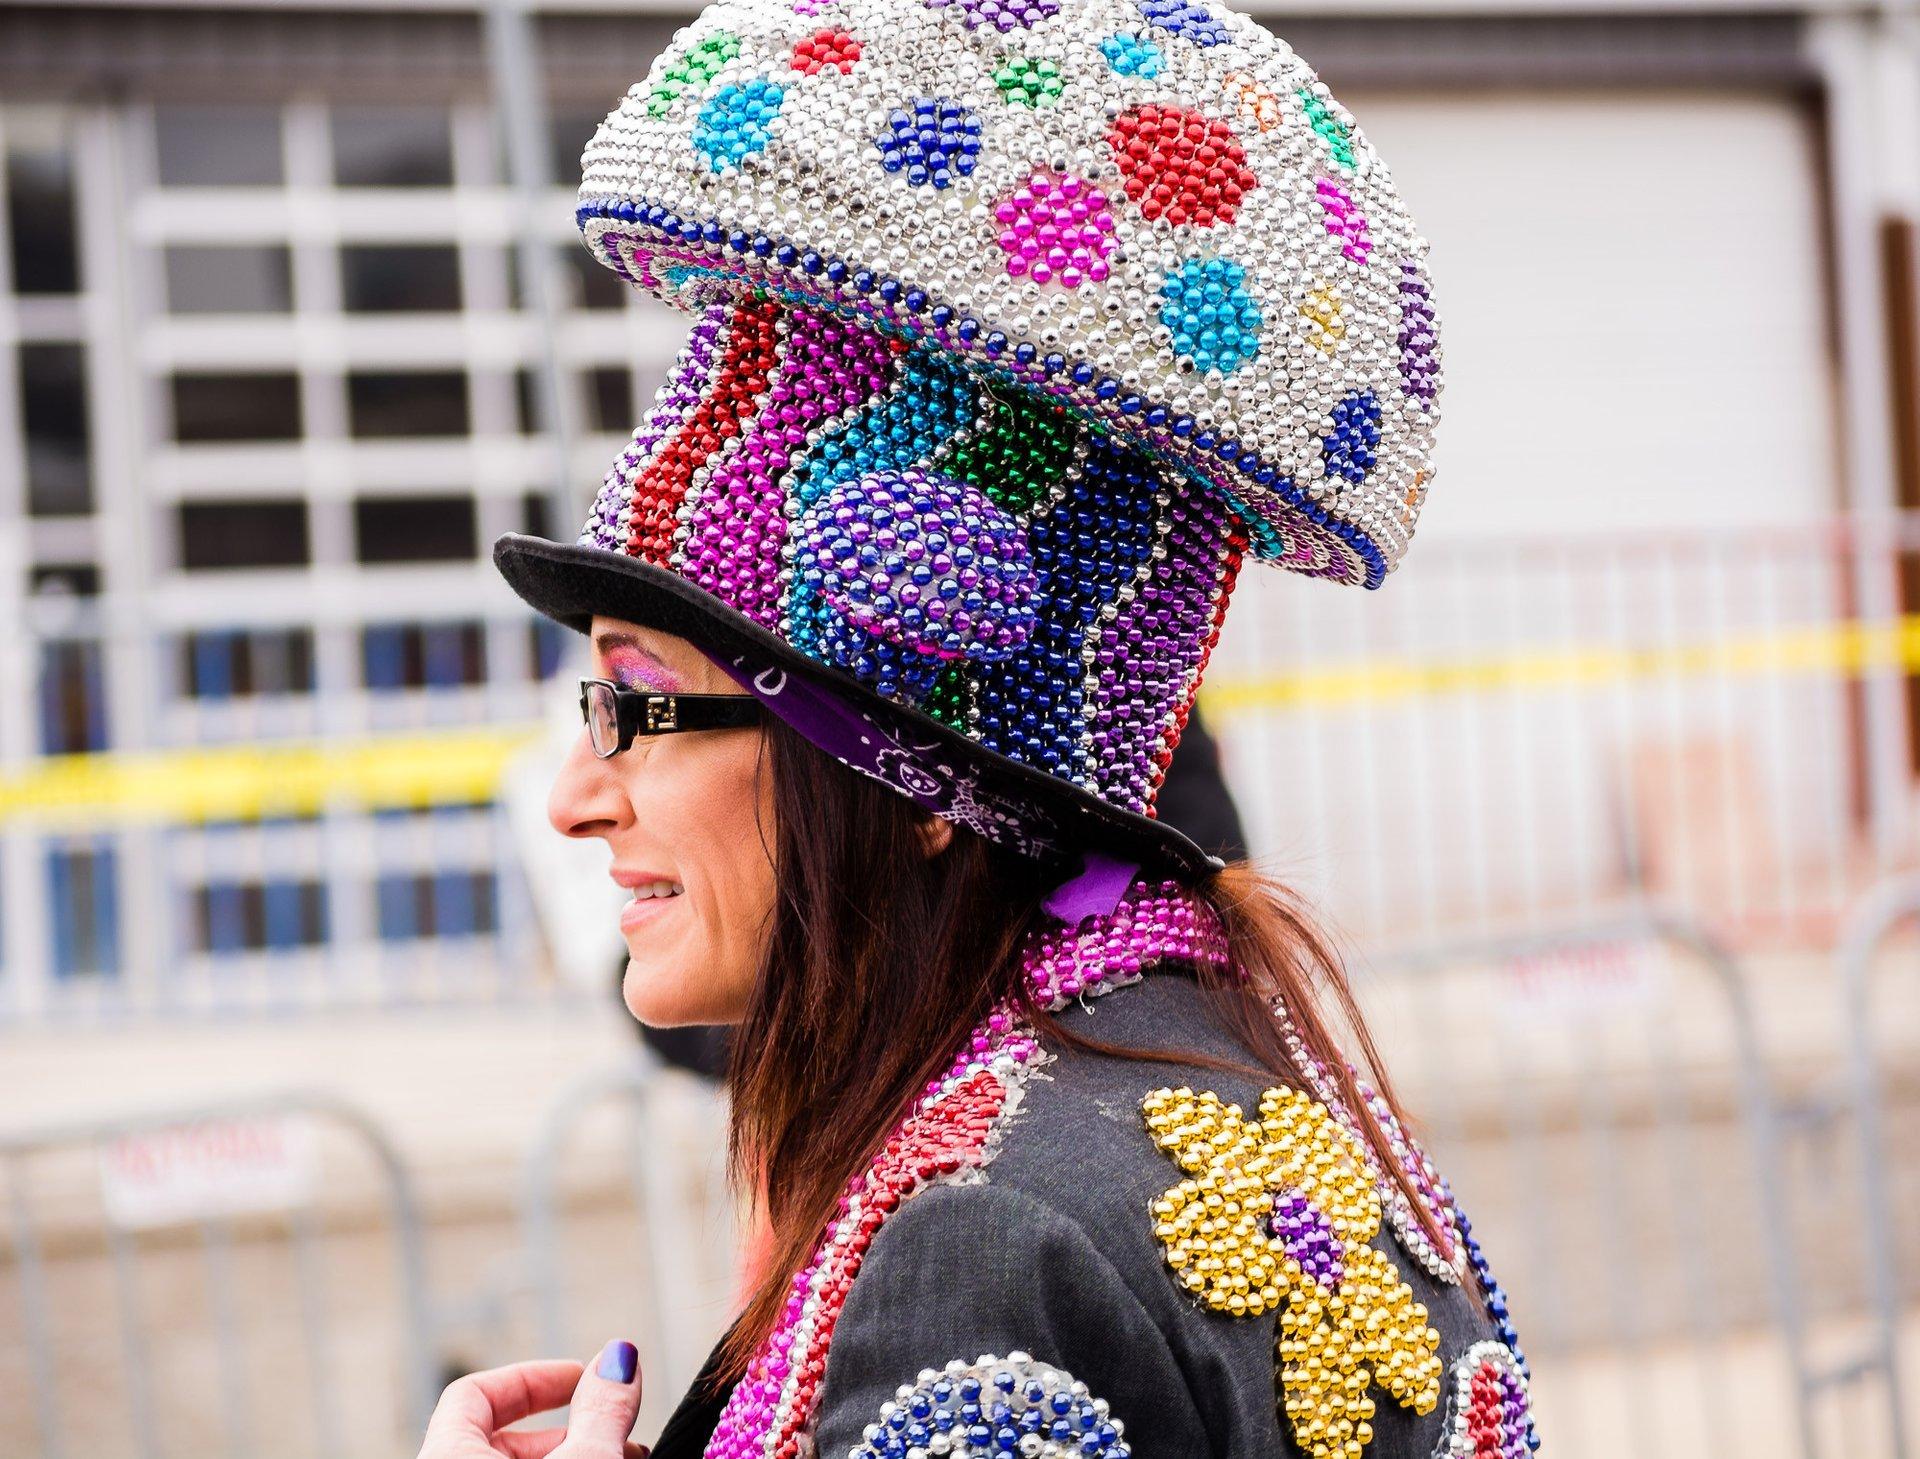 Best time for St.Louis Mardi Gras (Soulard Mardi Gras) in Midwest 2020